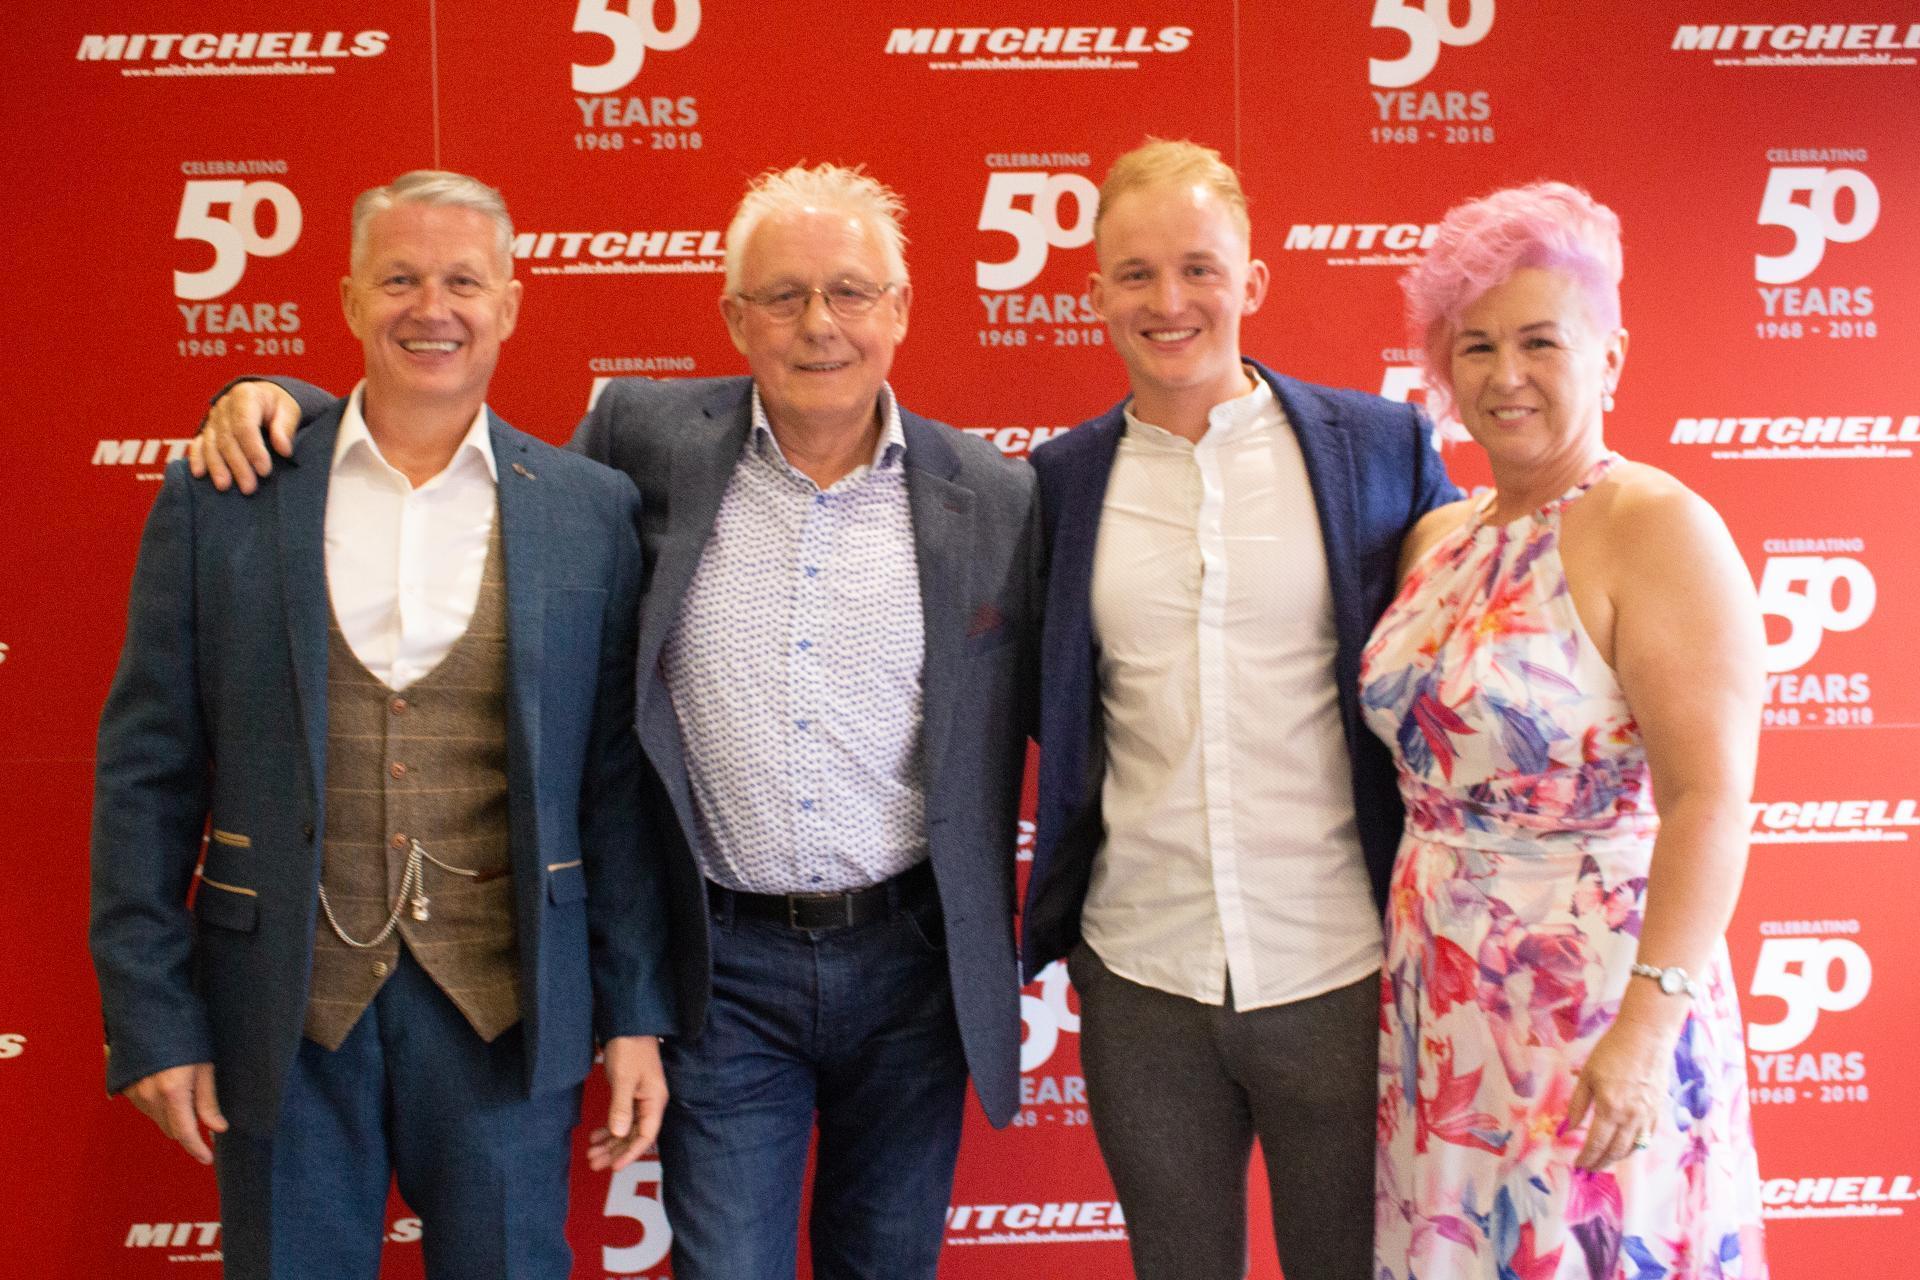 Meet The Mitchells Family